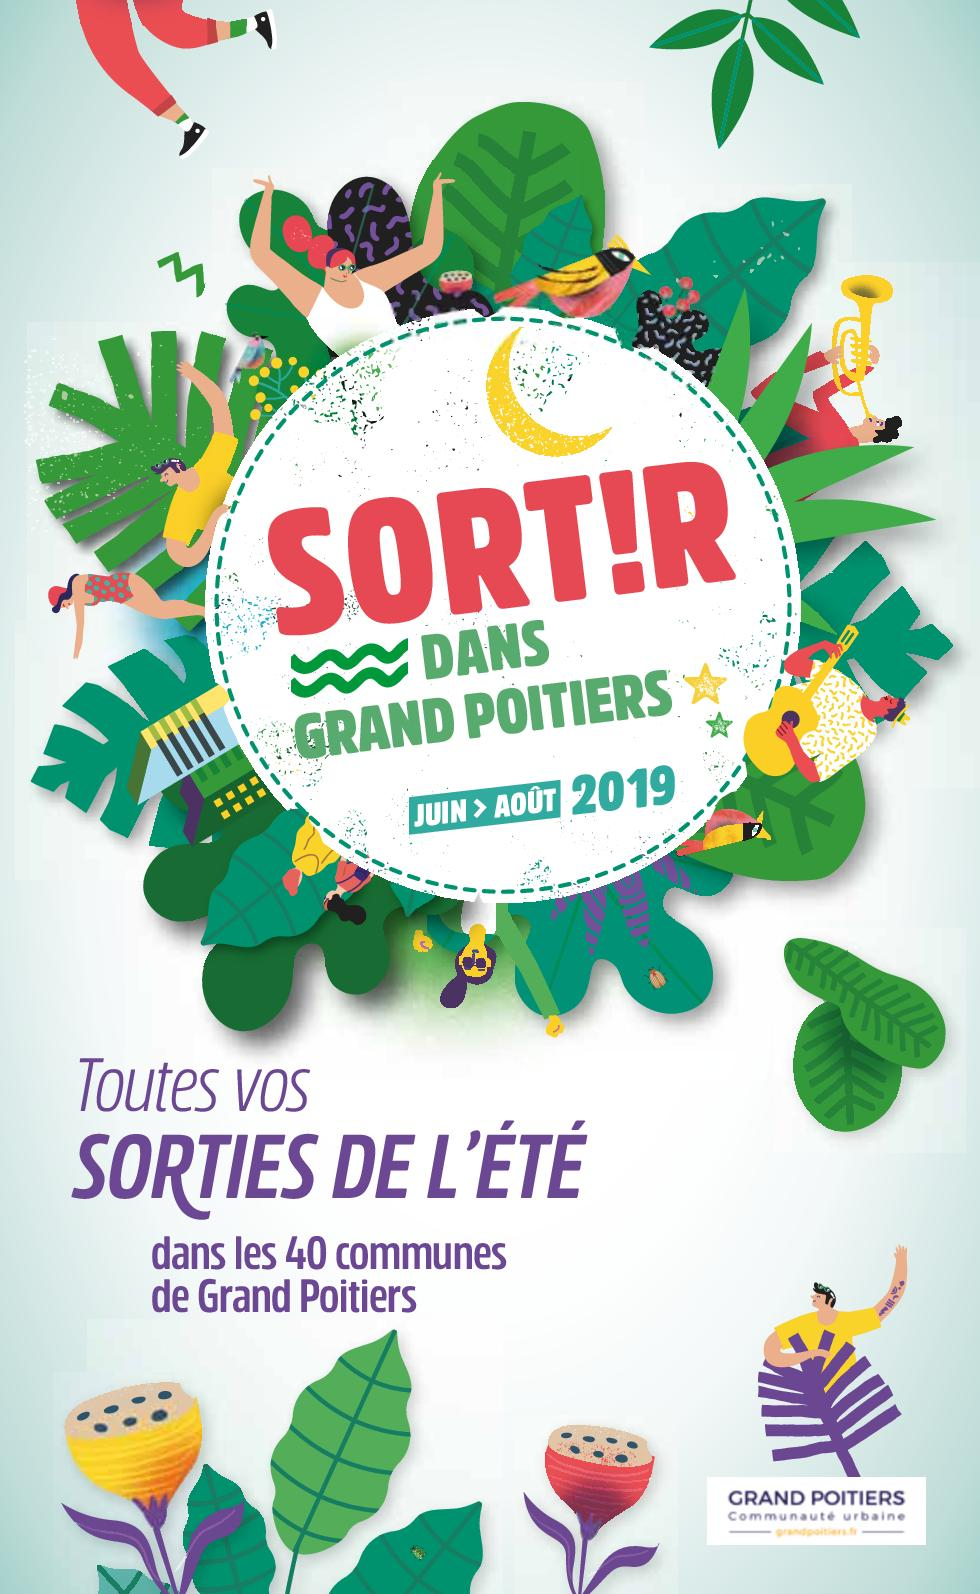 Poitiers Grand 2019 Sortir Dans Calaméo 0v8Nwnm